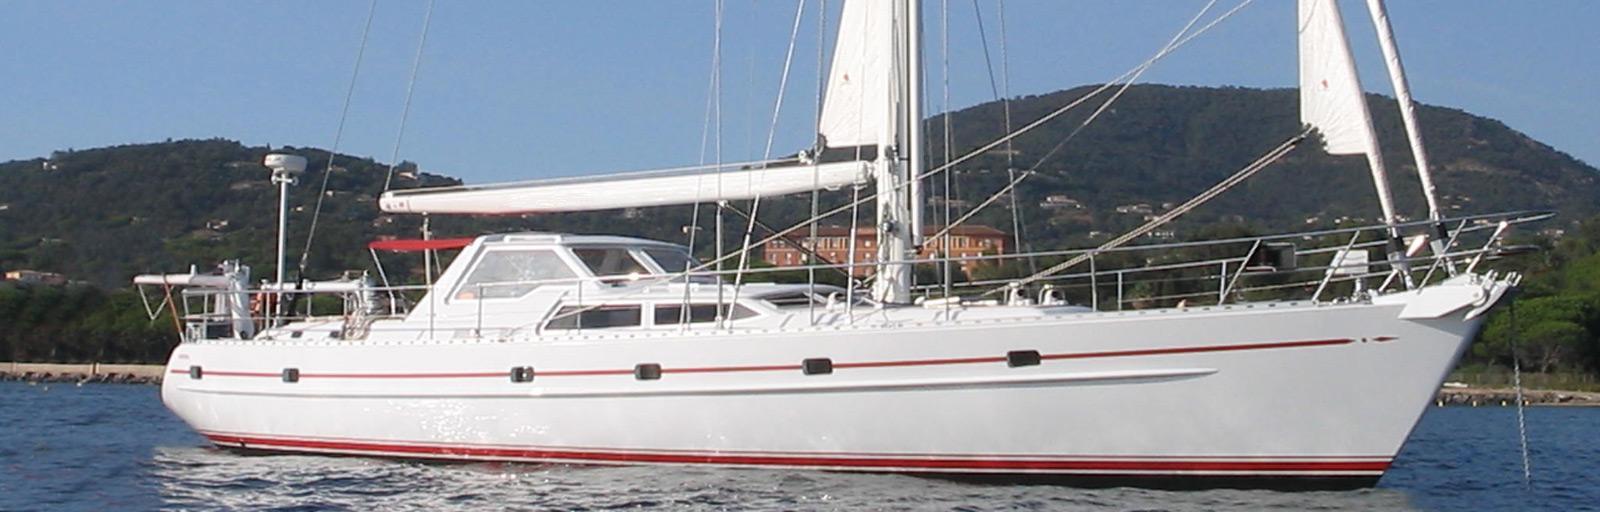 Nordia 65 - AYC Yachtbroker